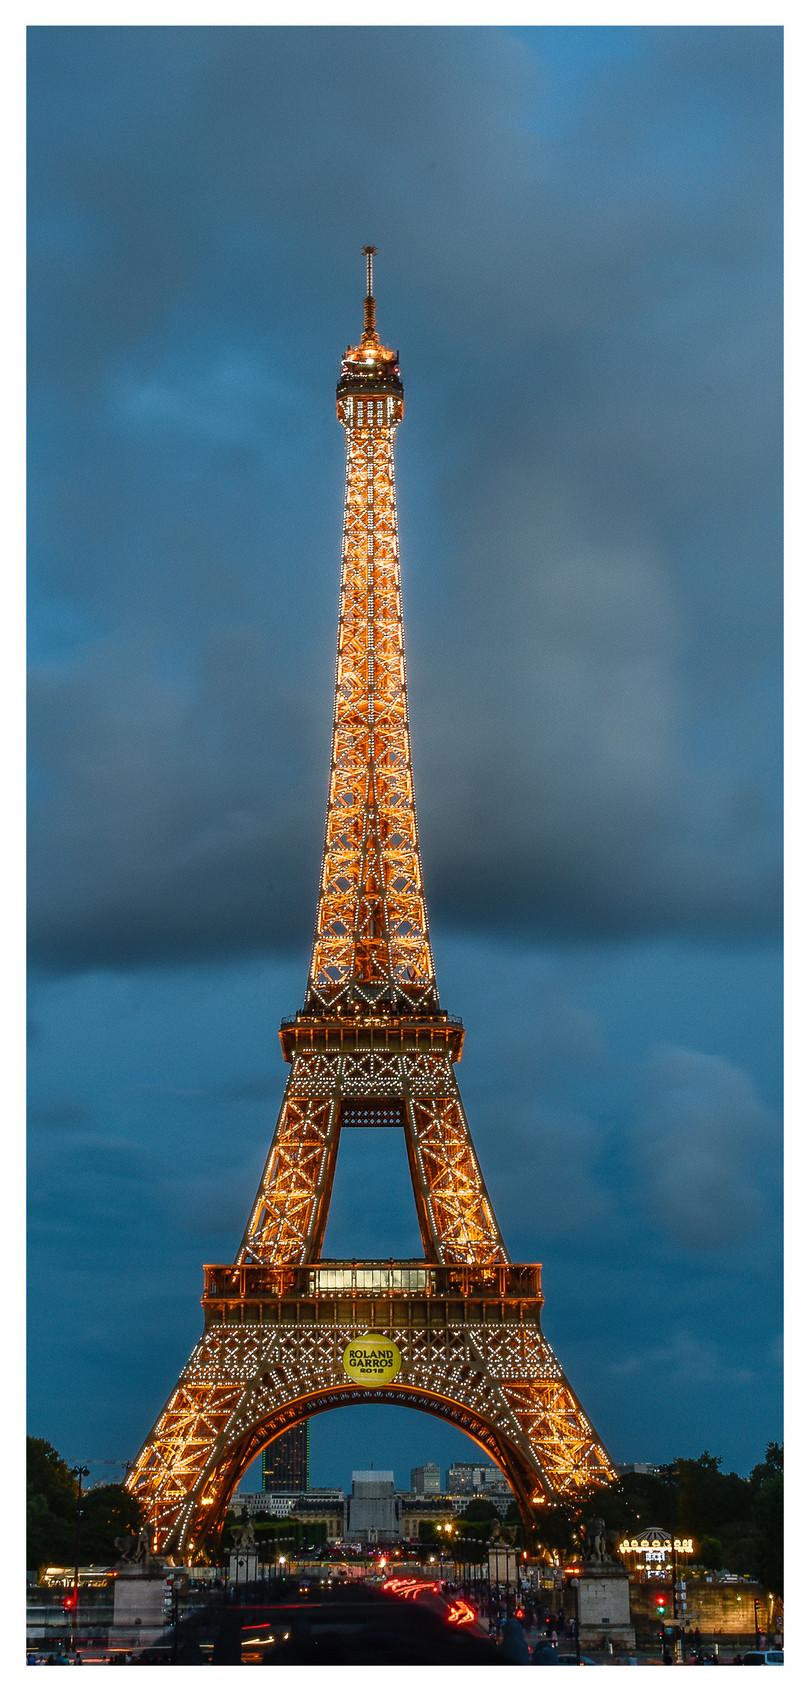 Menara Eiffel Night View Wallpaper Ponsel Gambar Unduh